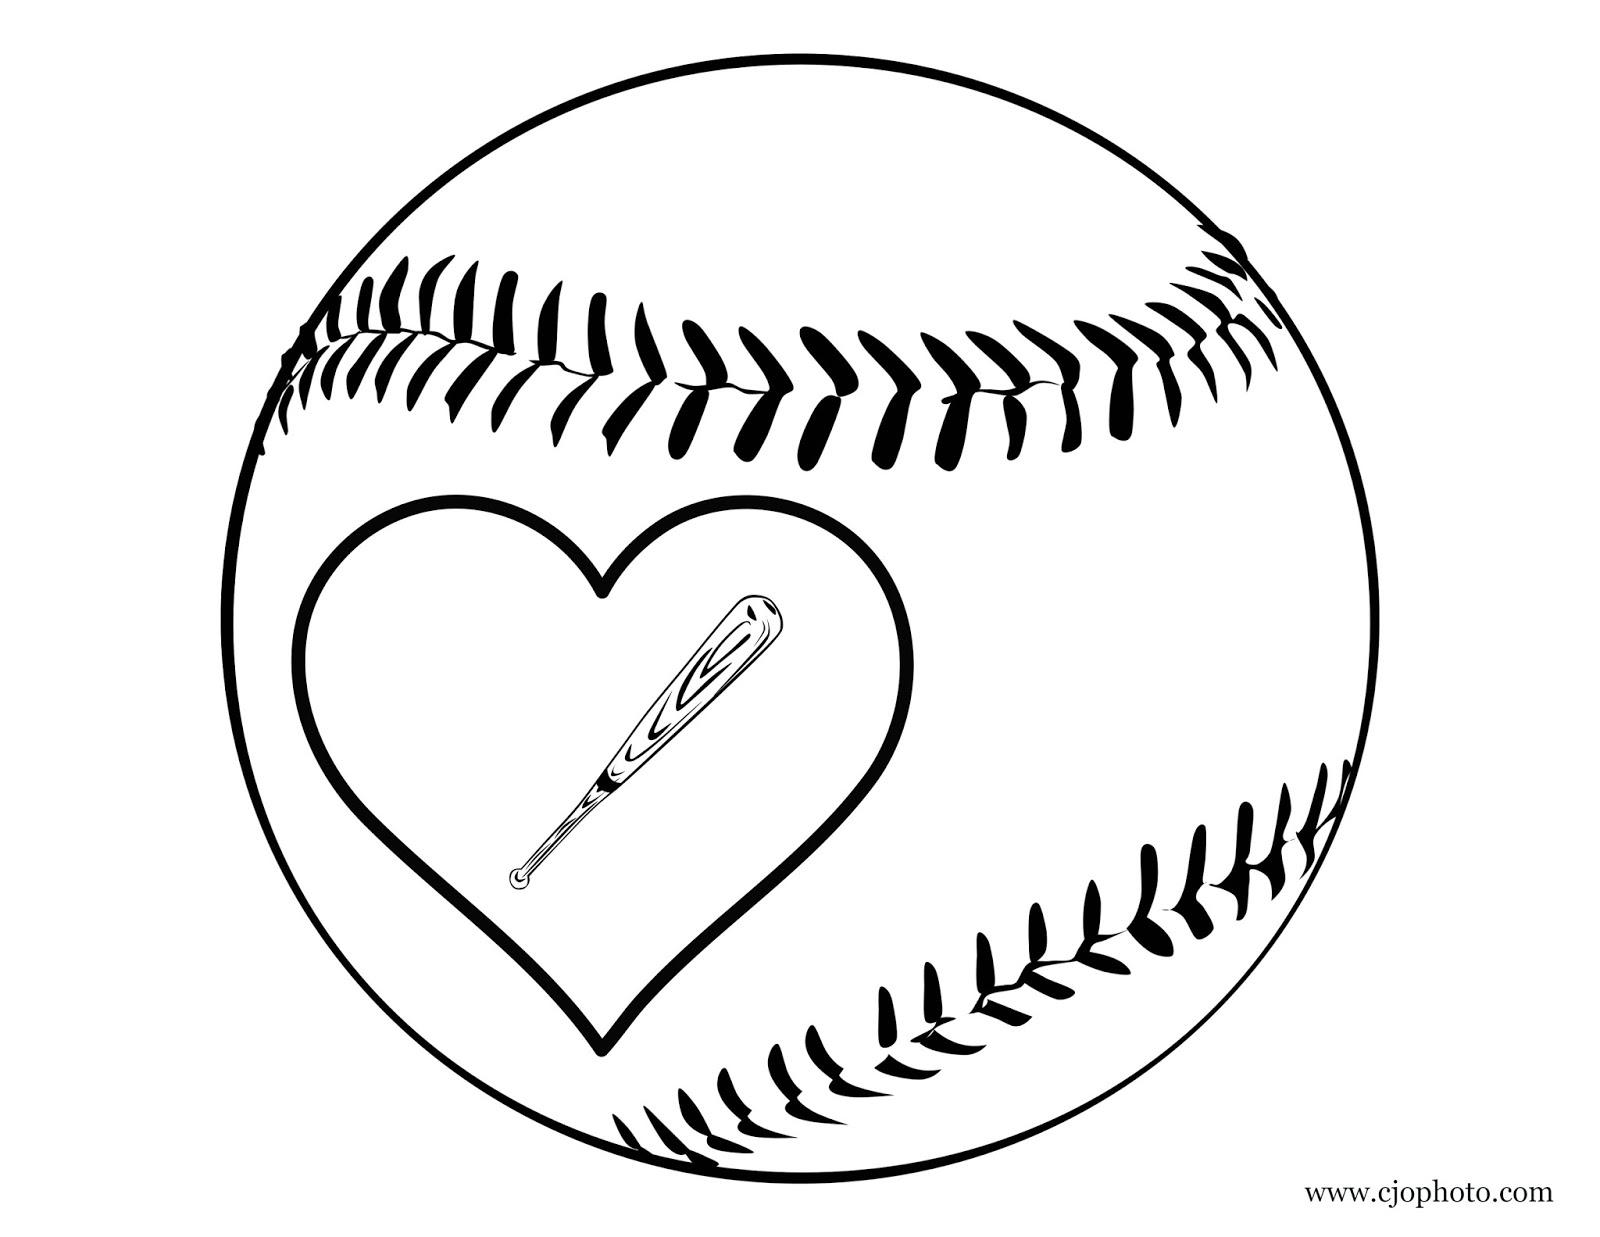 Cjo Photo Heart Baseball Coloring Page